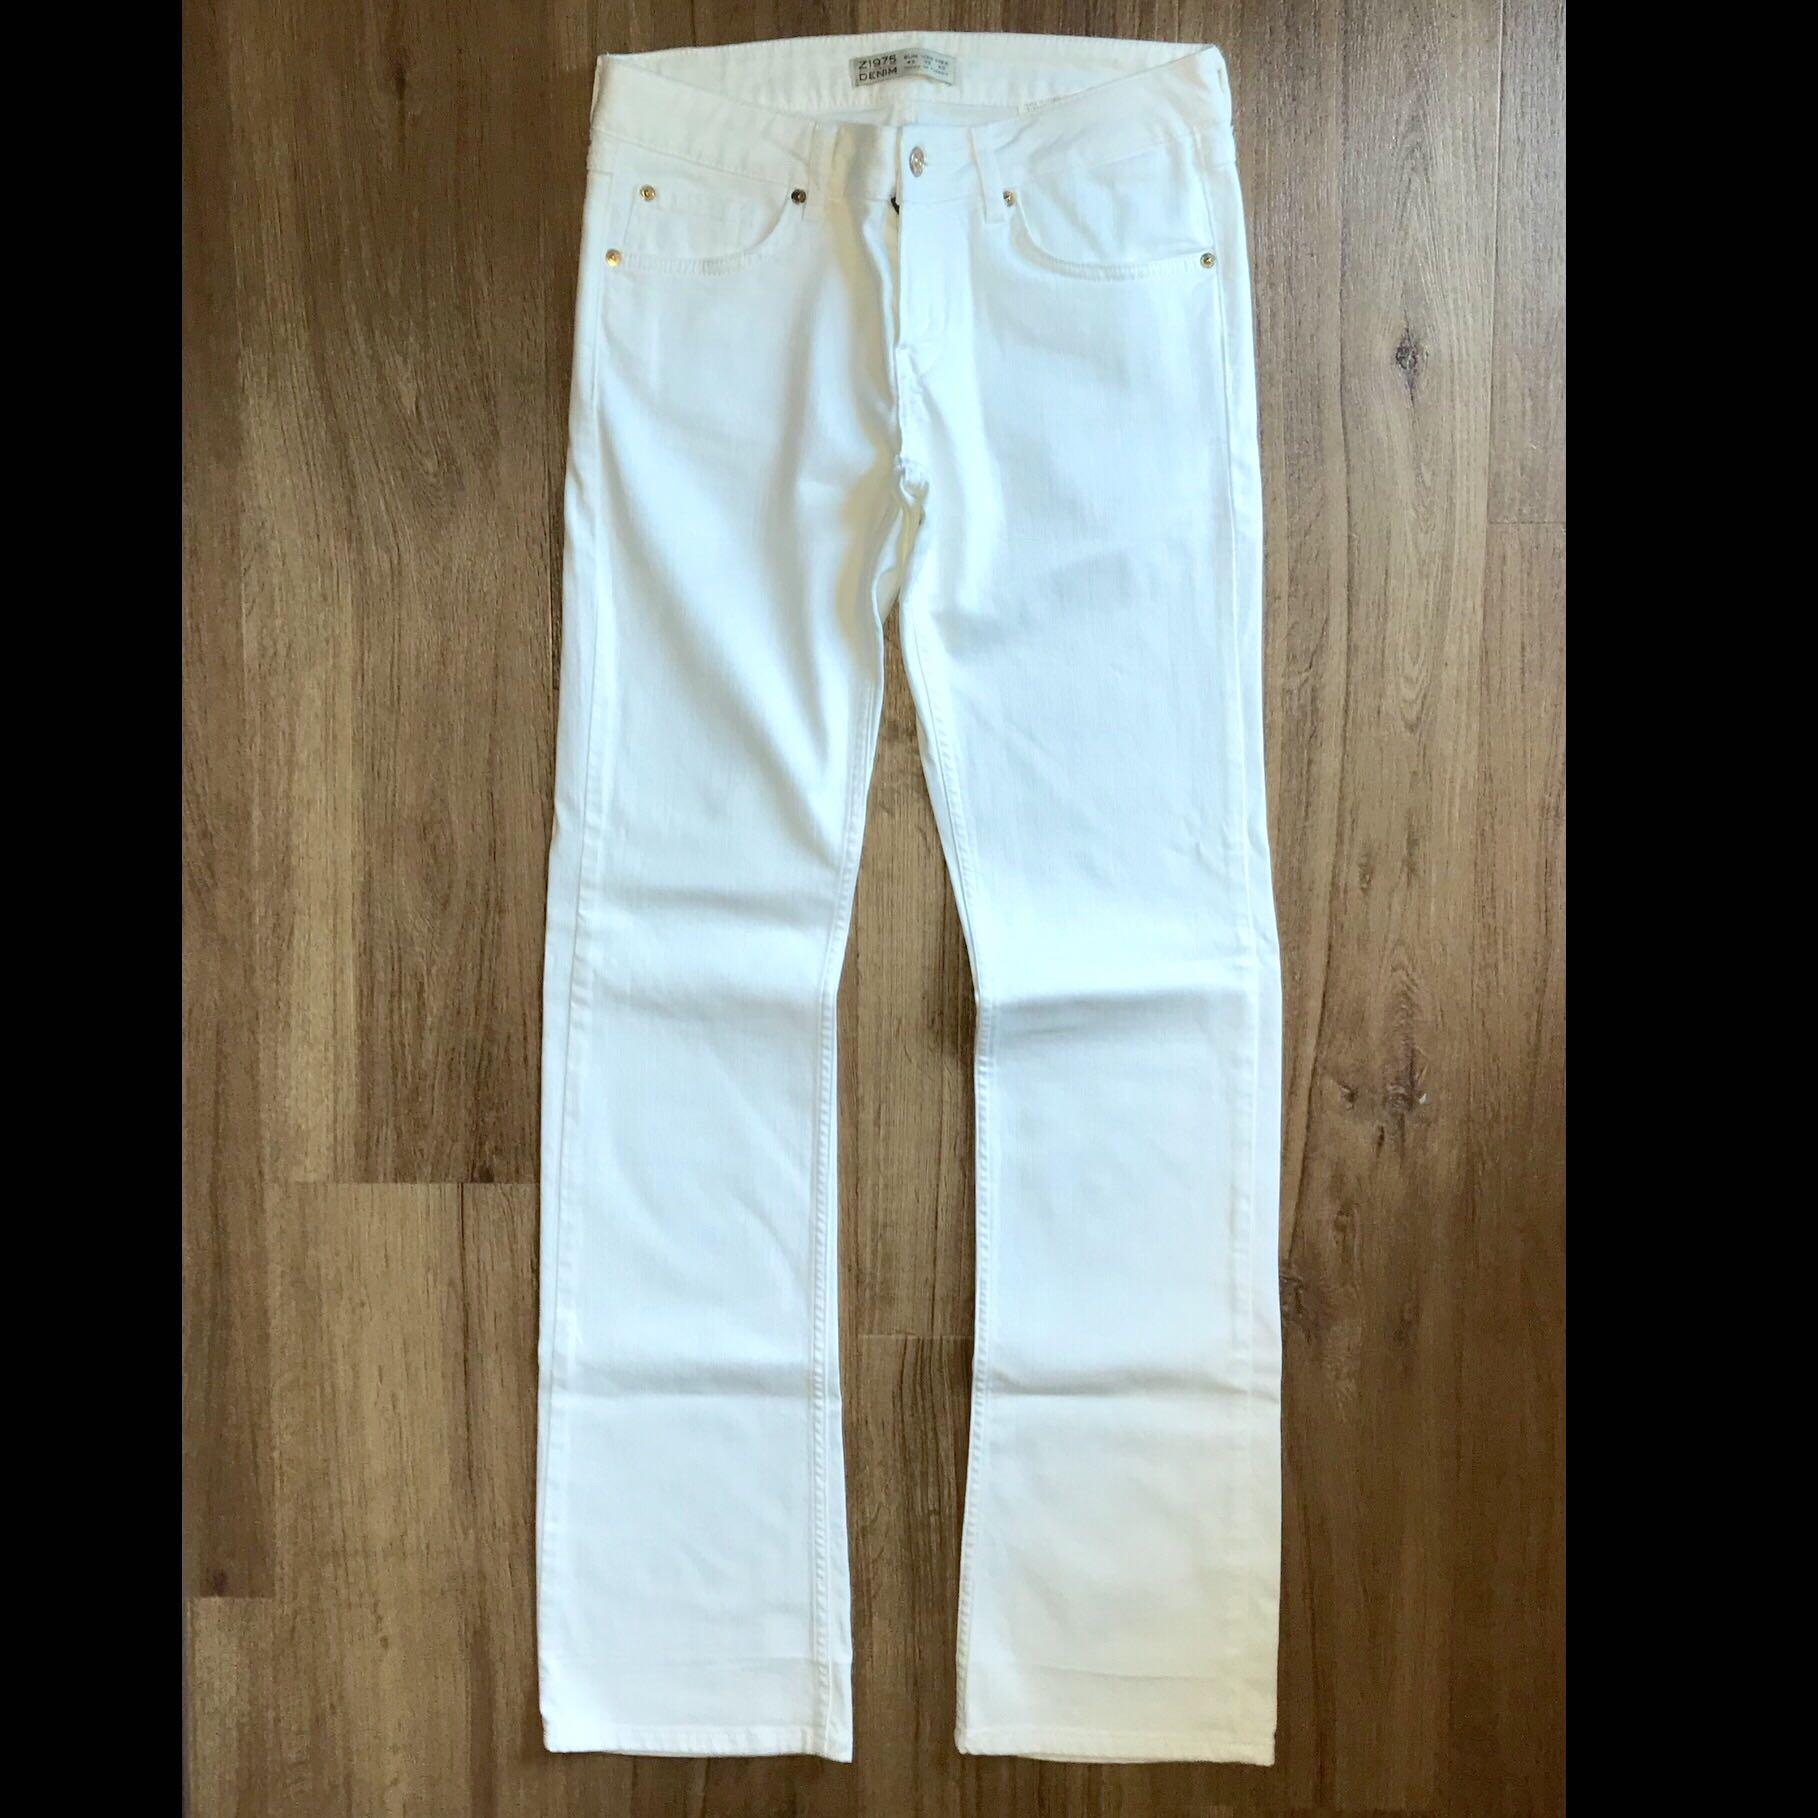 159374c0 Zara White Jeans Size EUR 40, Women's Fashion, Clothes, Pants, Jeans ...